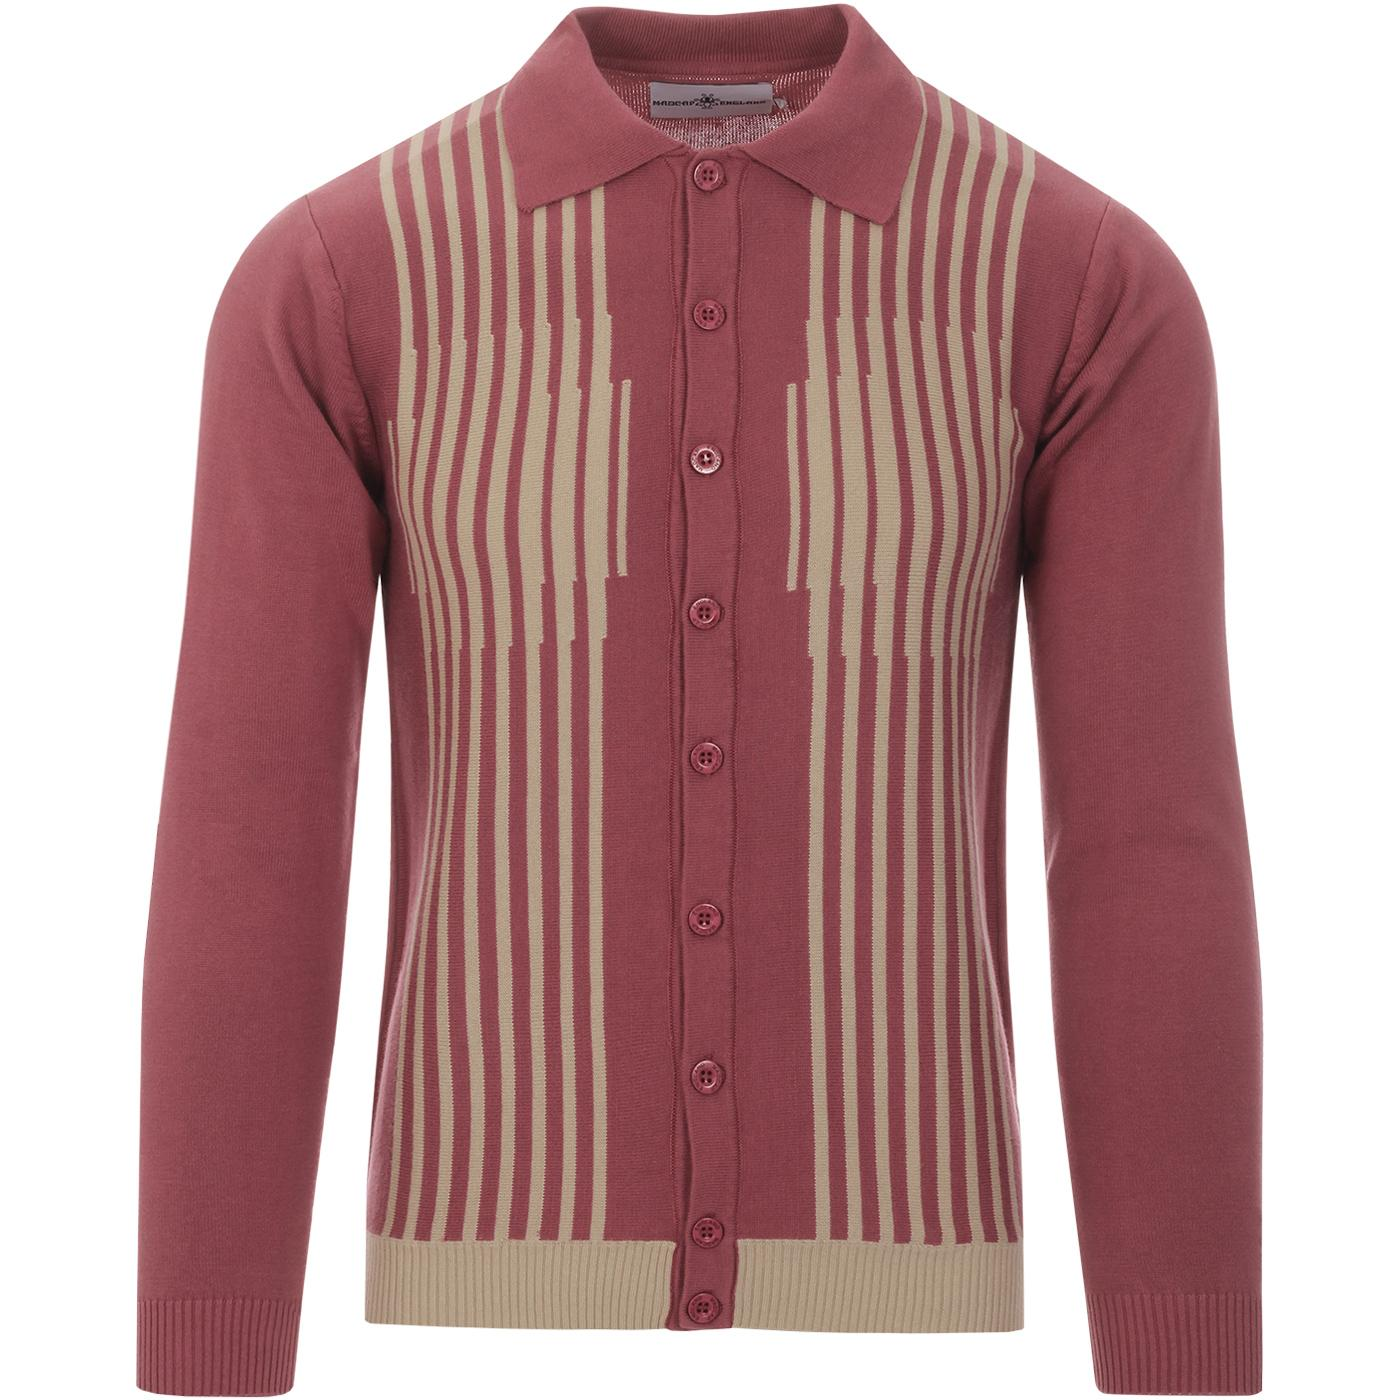 Kinetic MADCAP ENGLAND Mod Stripe Polo Cardigan